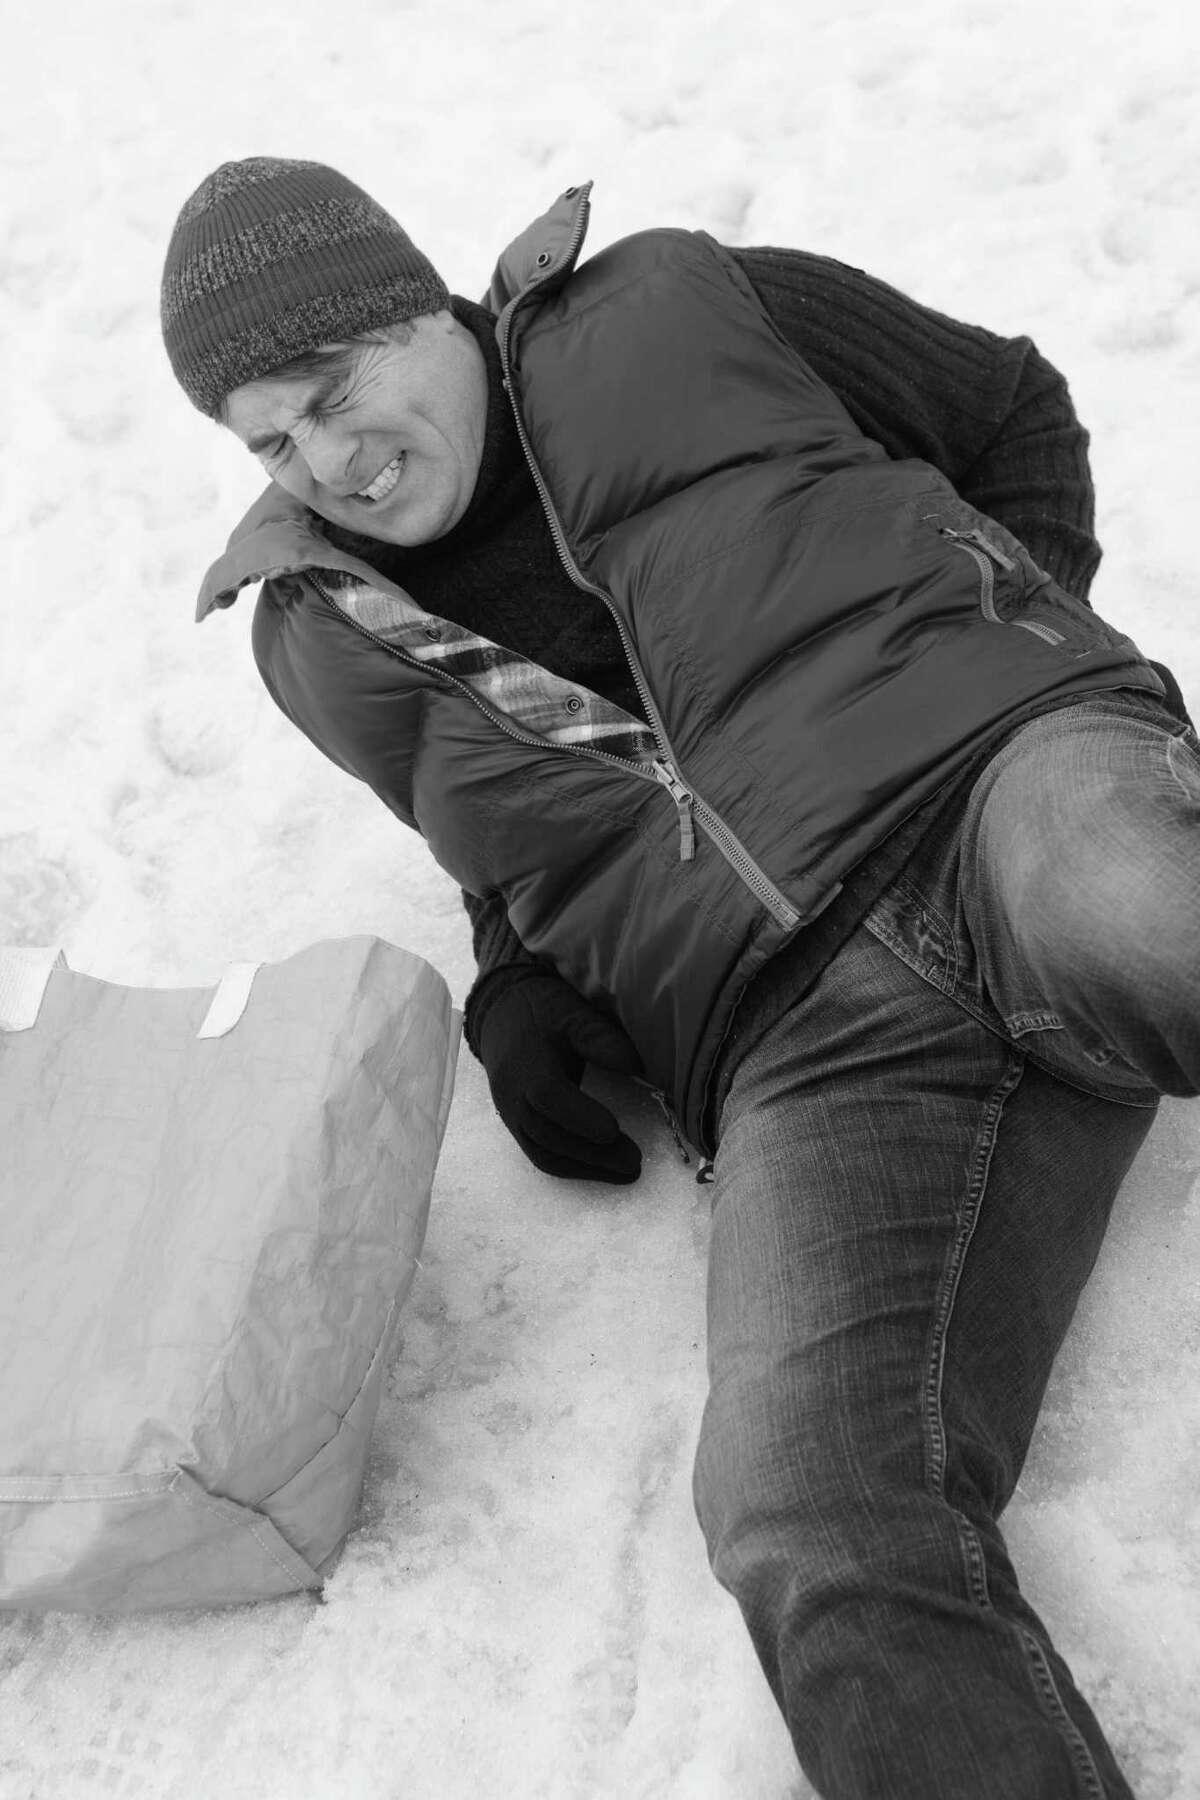 Don't slip on the ice! (Fotolia.com)